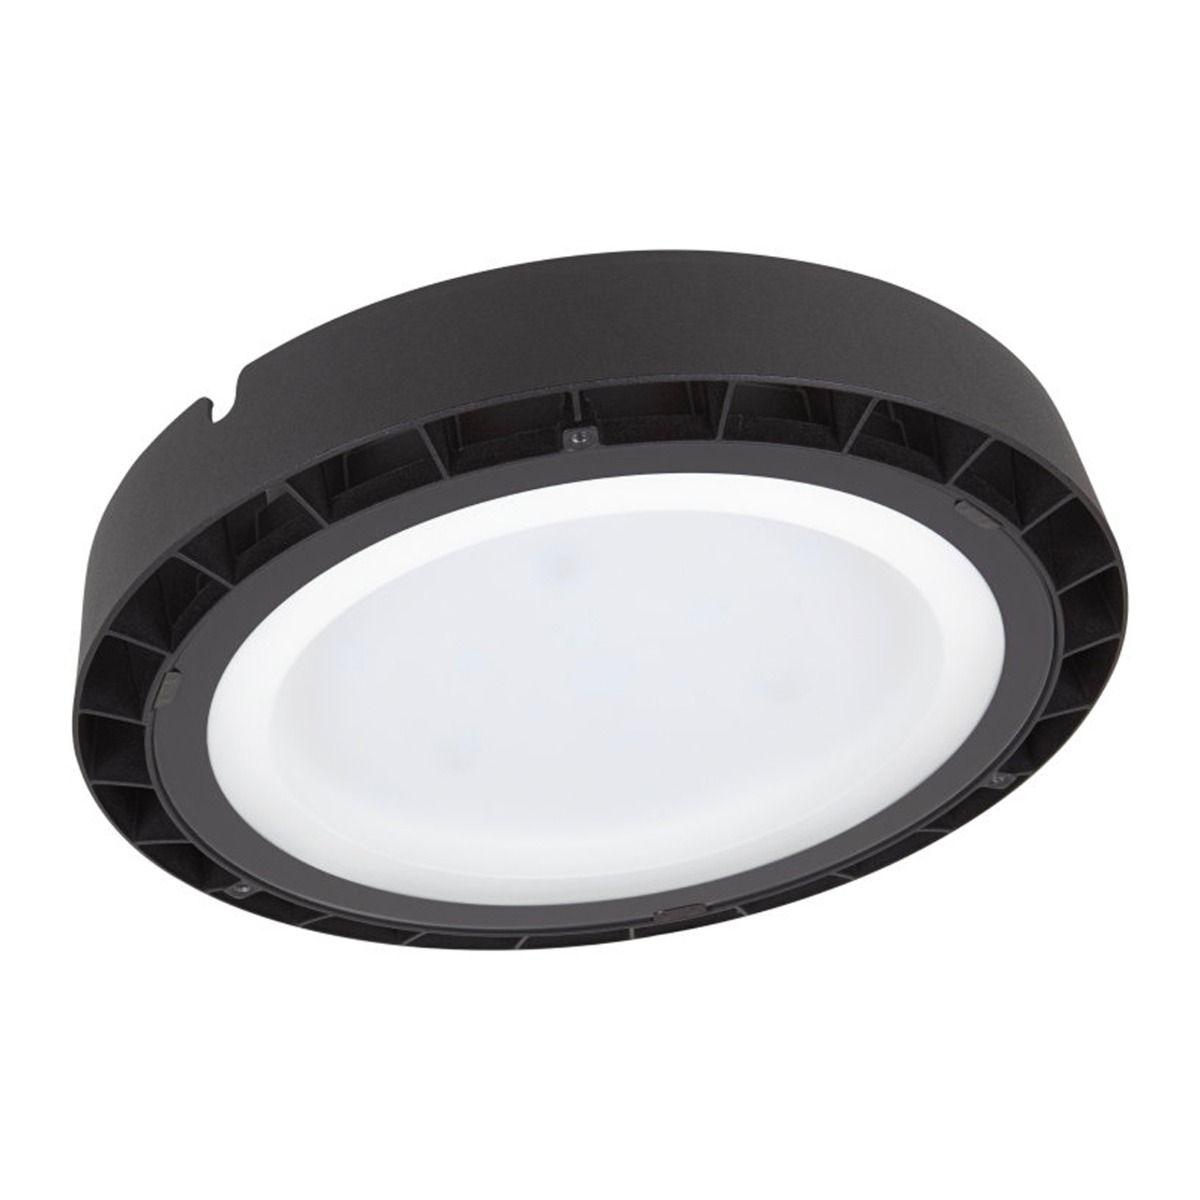 Ledvance LED High Bay Value 100W 4000K IP65 10000lm 100D | Replacer for 200W